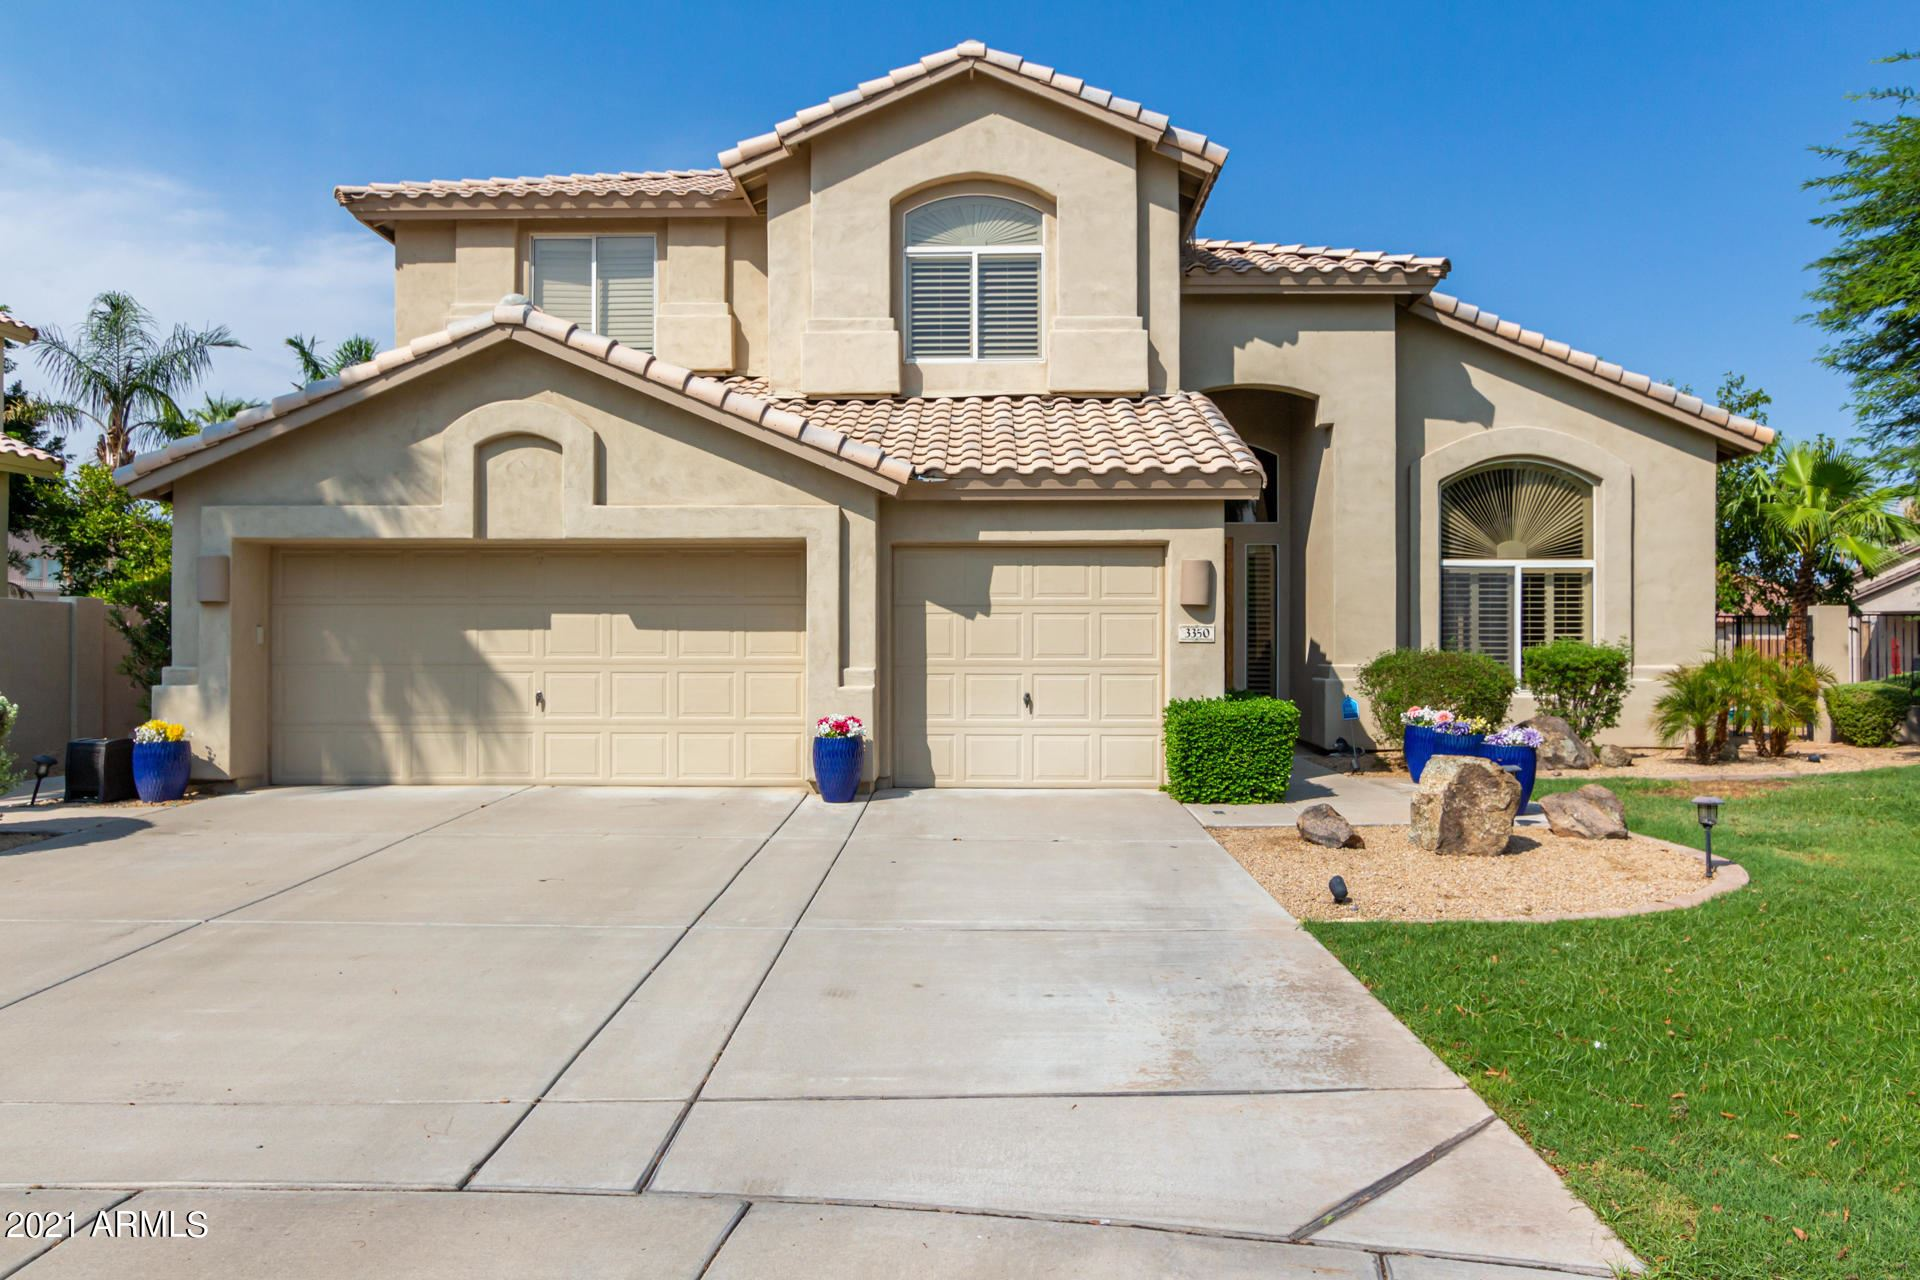 3350 S BEVERLY Place, Chandler, AZ 85248 - MLS#: 6266804